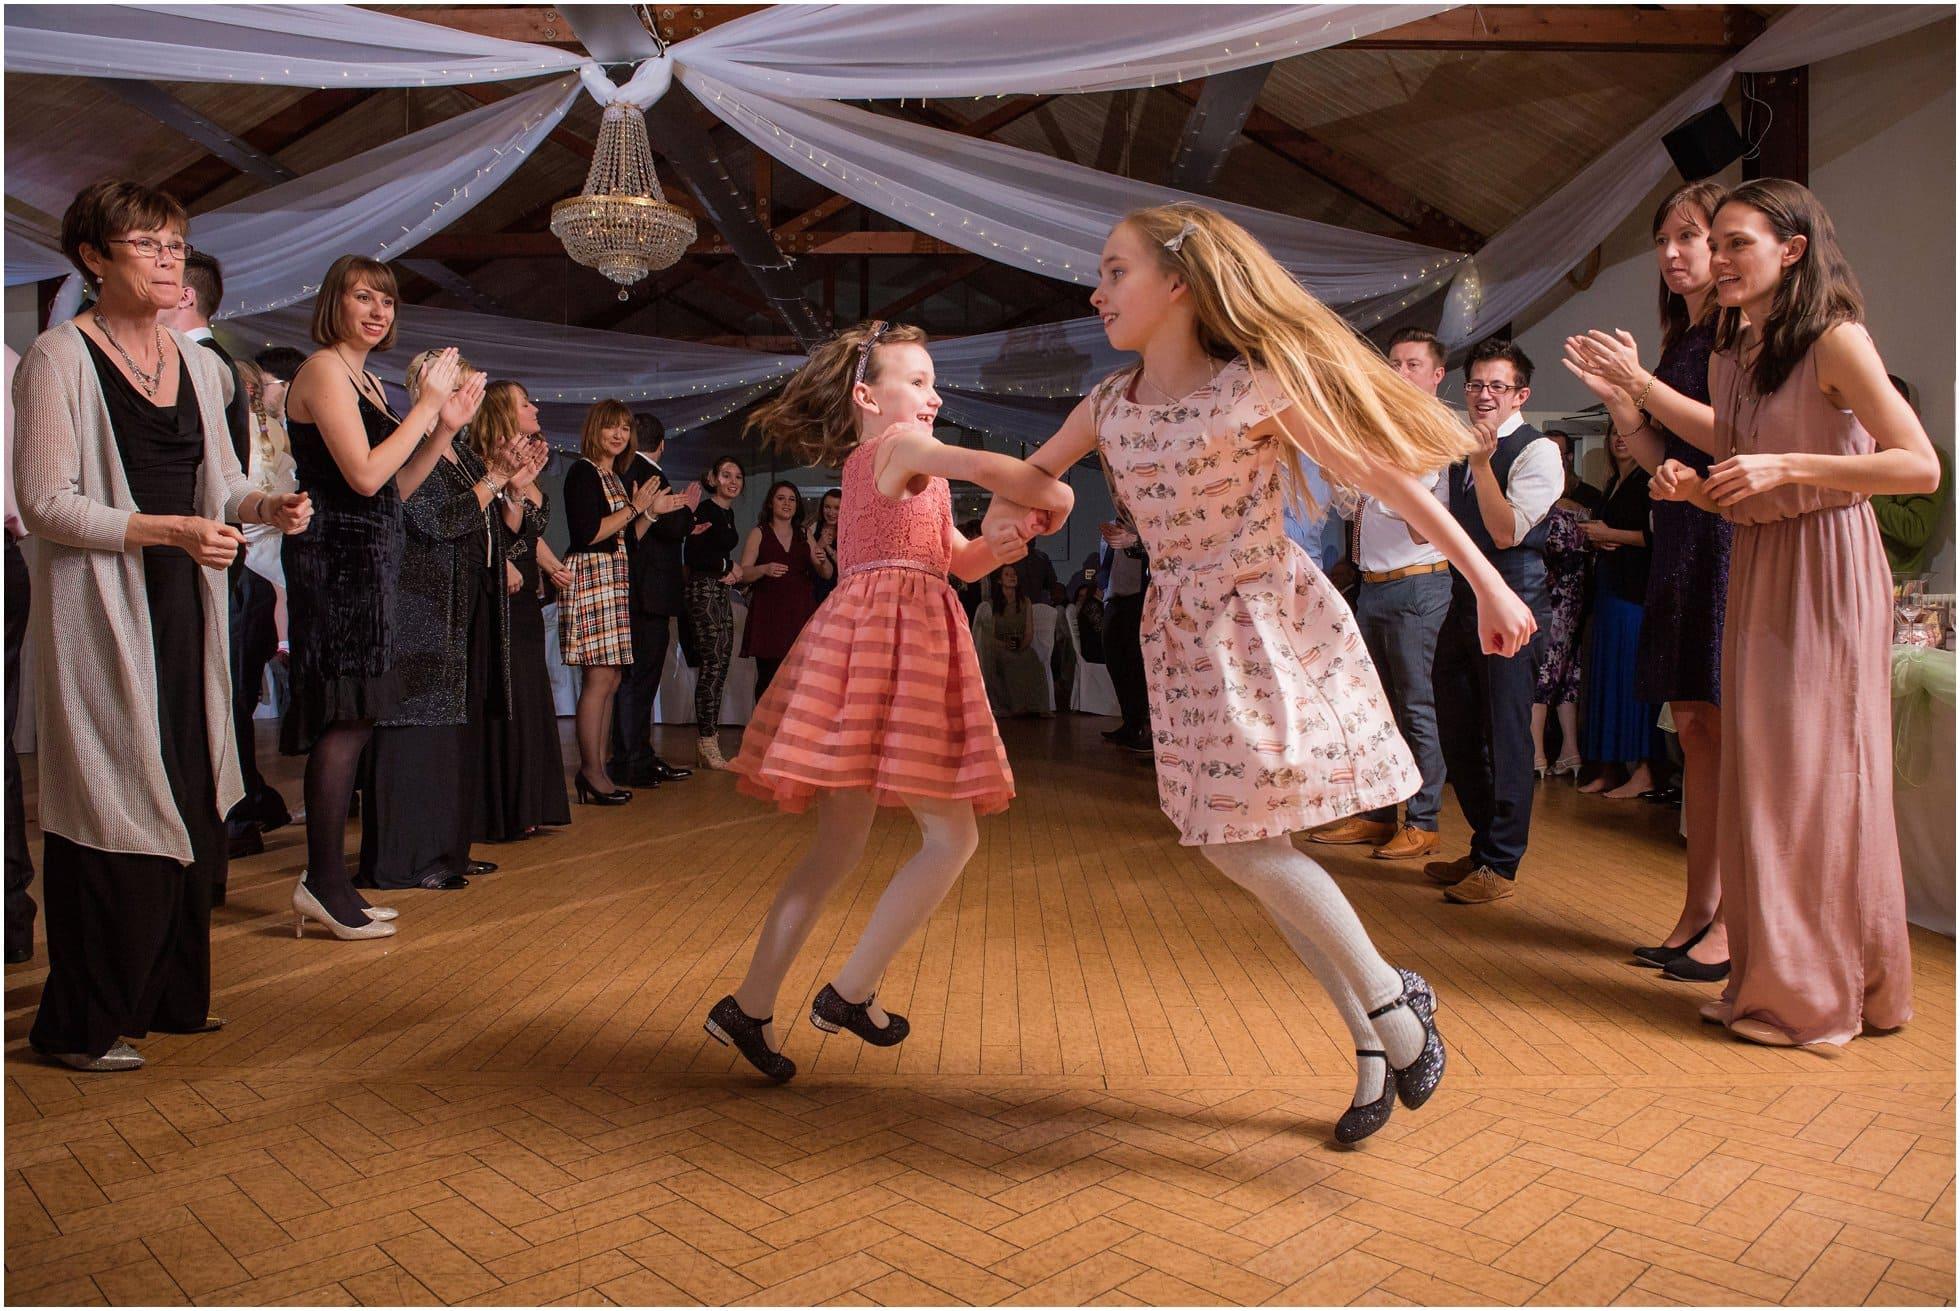 Girls spinning on the dancefloor